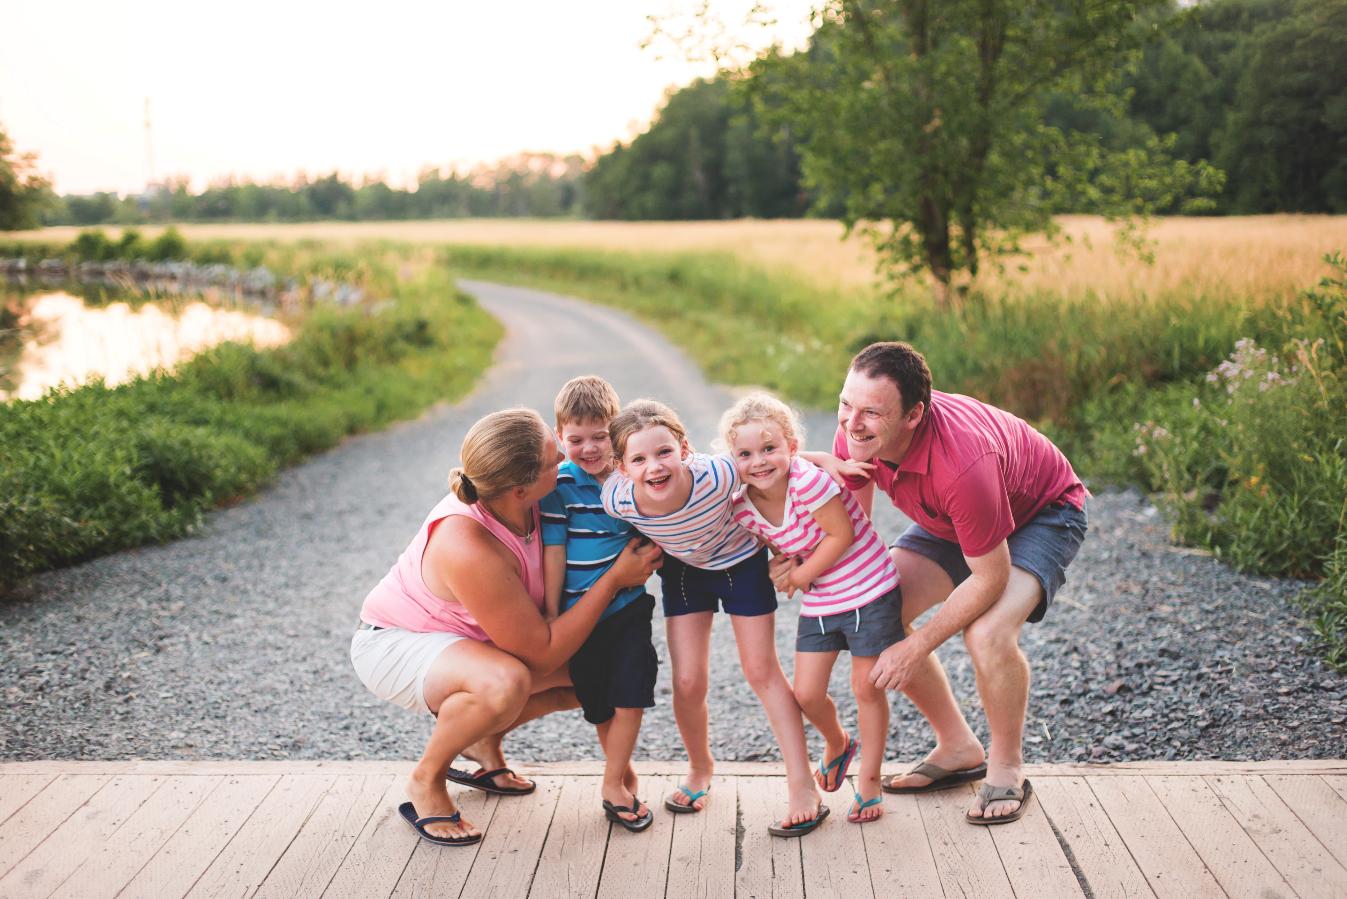 Hamilton-Toronto-Burlington-Oakville-welland-Niagara-Cambridge-Dundas-Ontario-Family-photographer-photography-Moments-by-Lauren-Nova-Scotia-Antigonish-Lifestyle-Session-Image-Photo-12.png